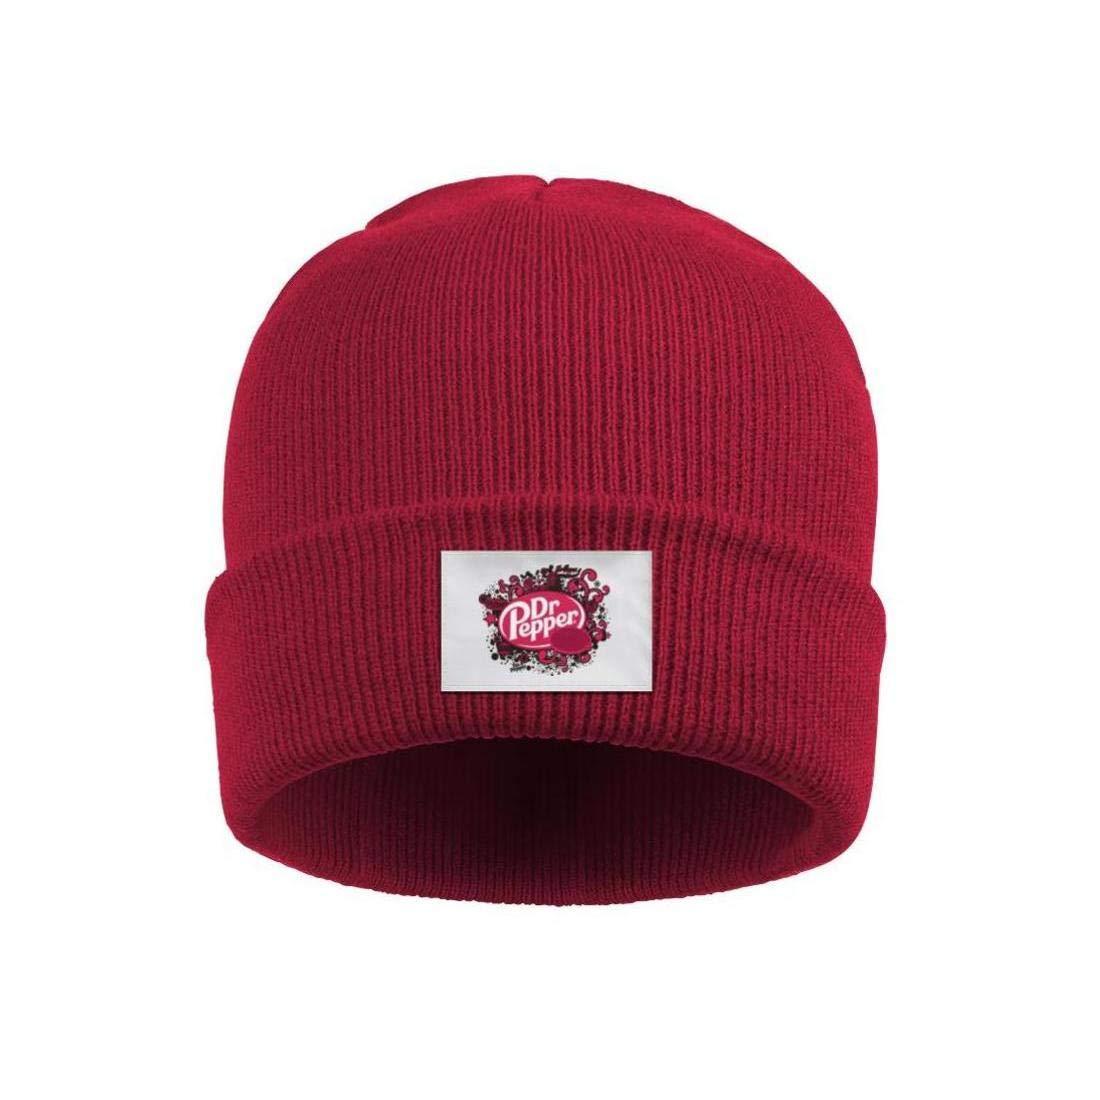 Curling Beanie Fleece Lined Cap Girls Ribbed Dr-Pepper-logo-30